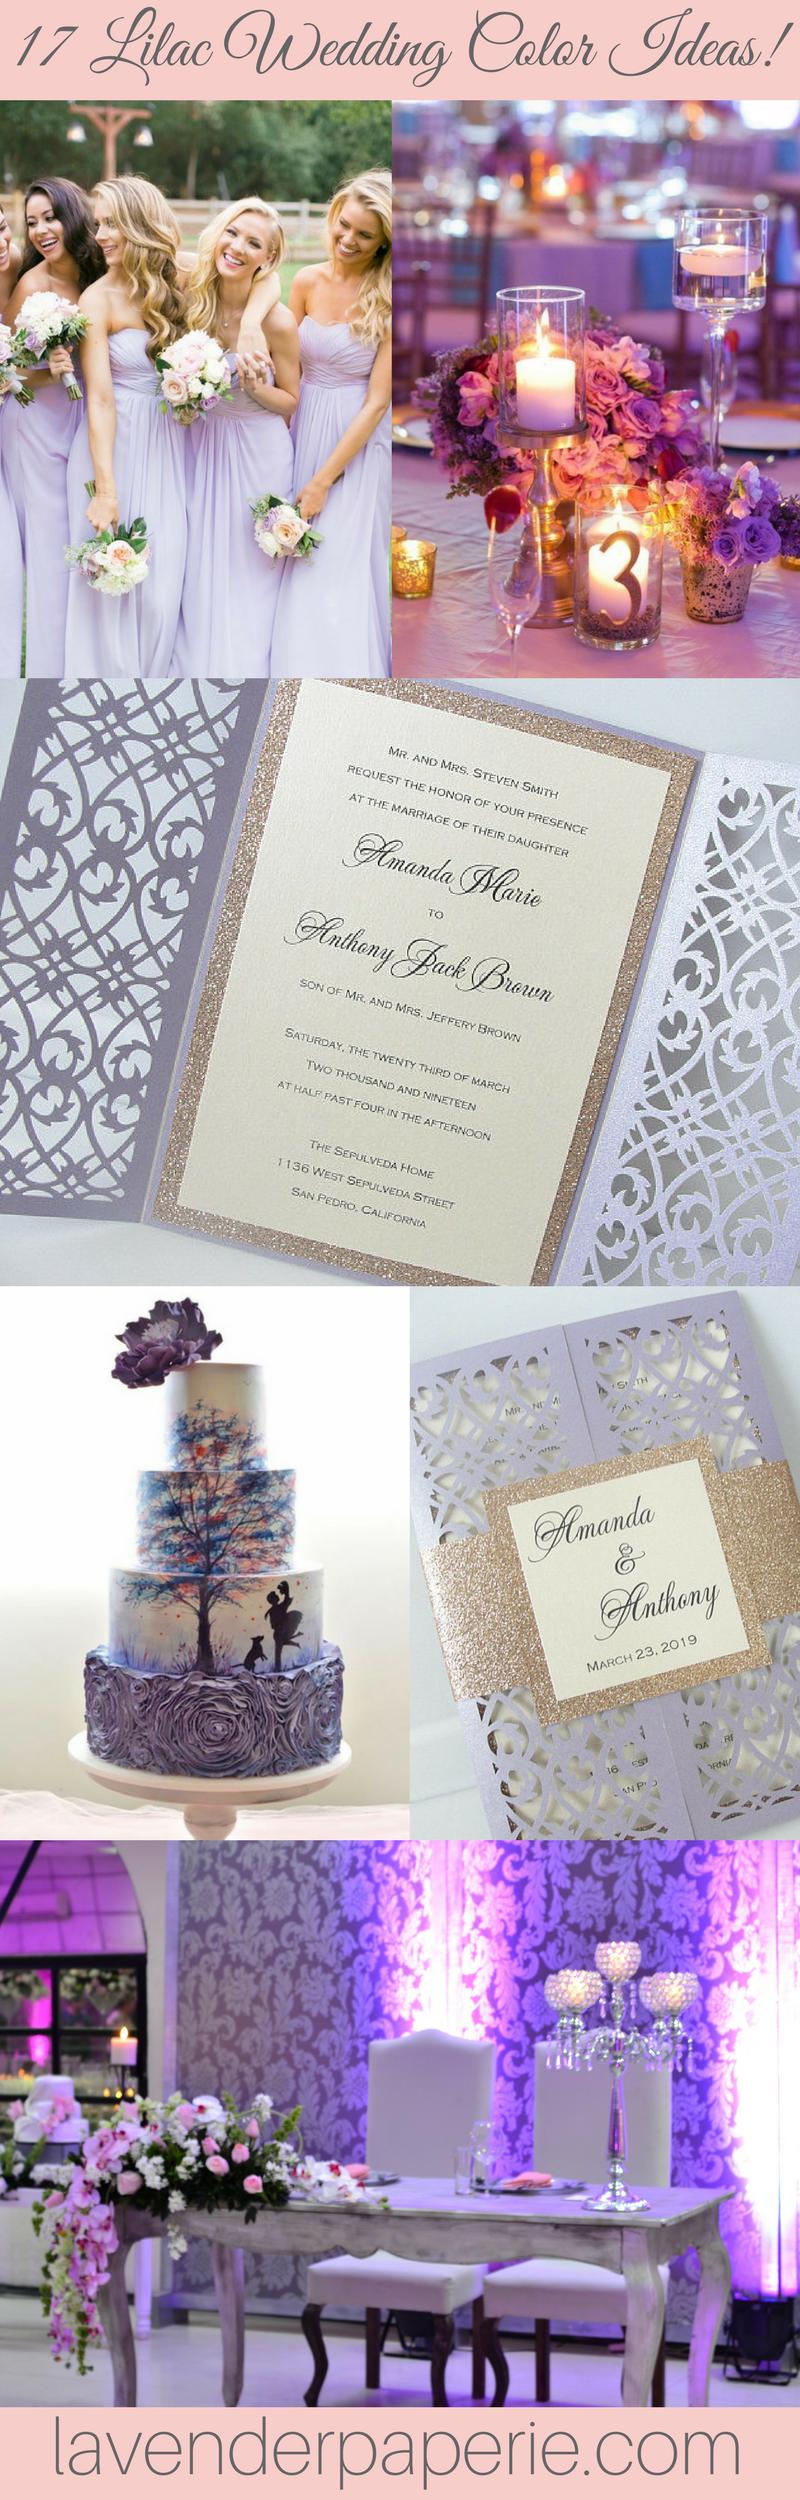 17 Lilac Wedding Color Ideas! #weddinginvitations, #lilacwedding ...